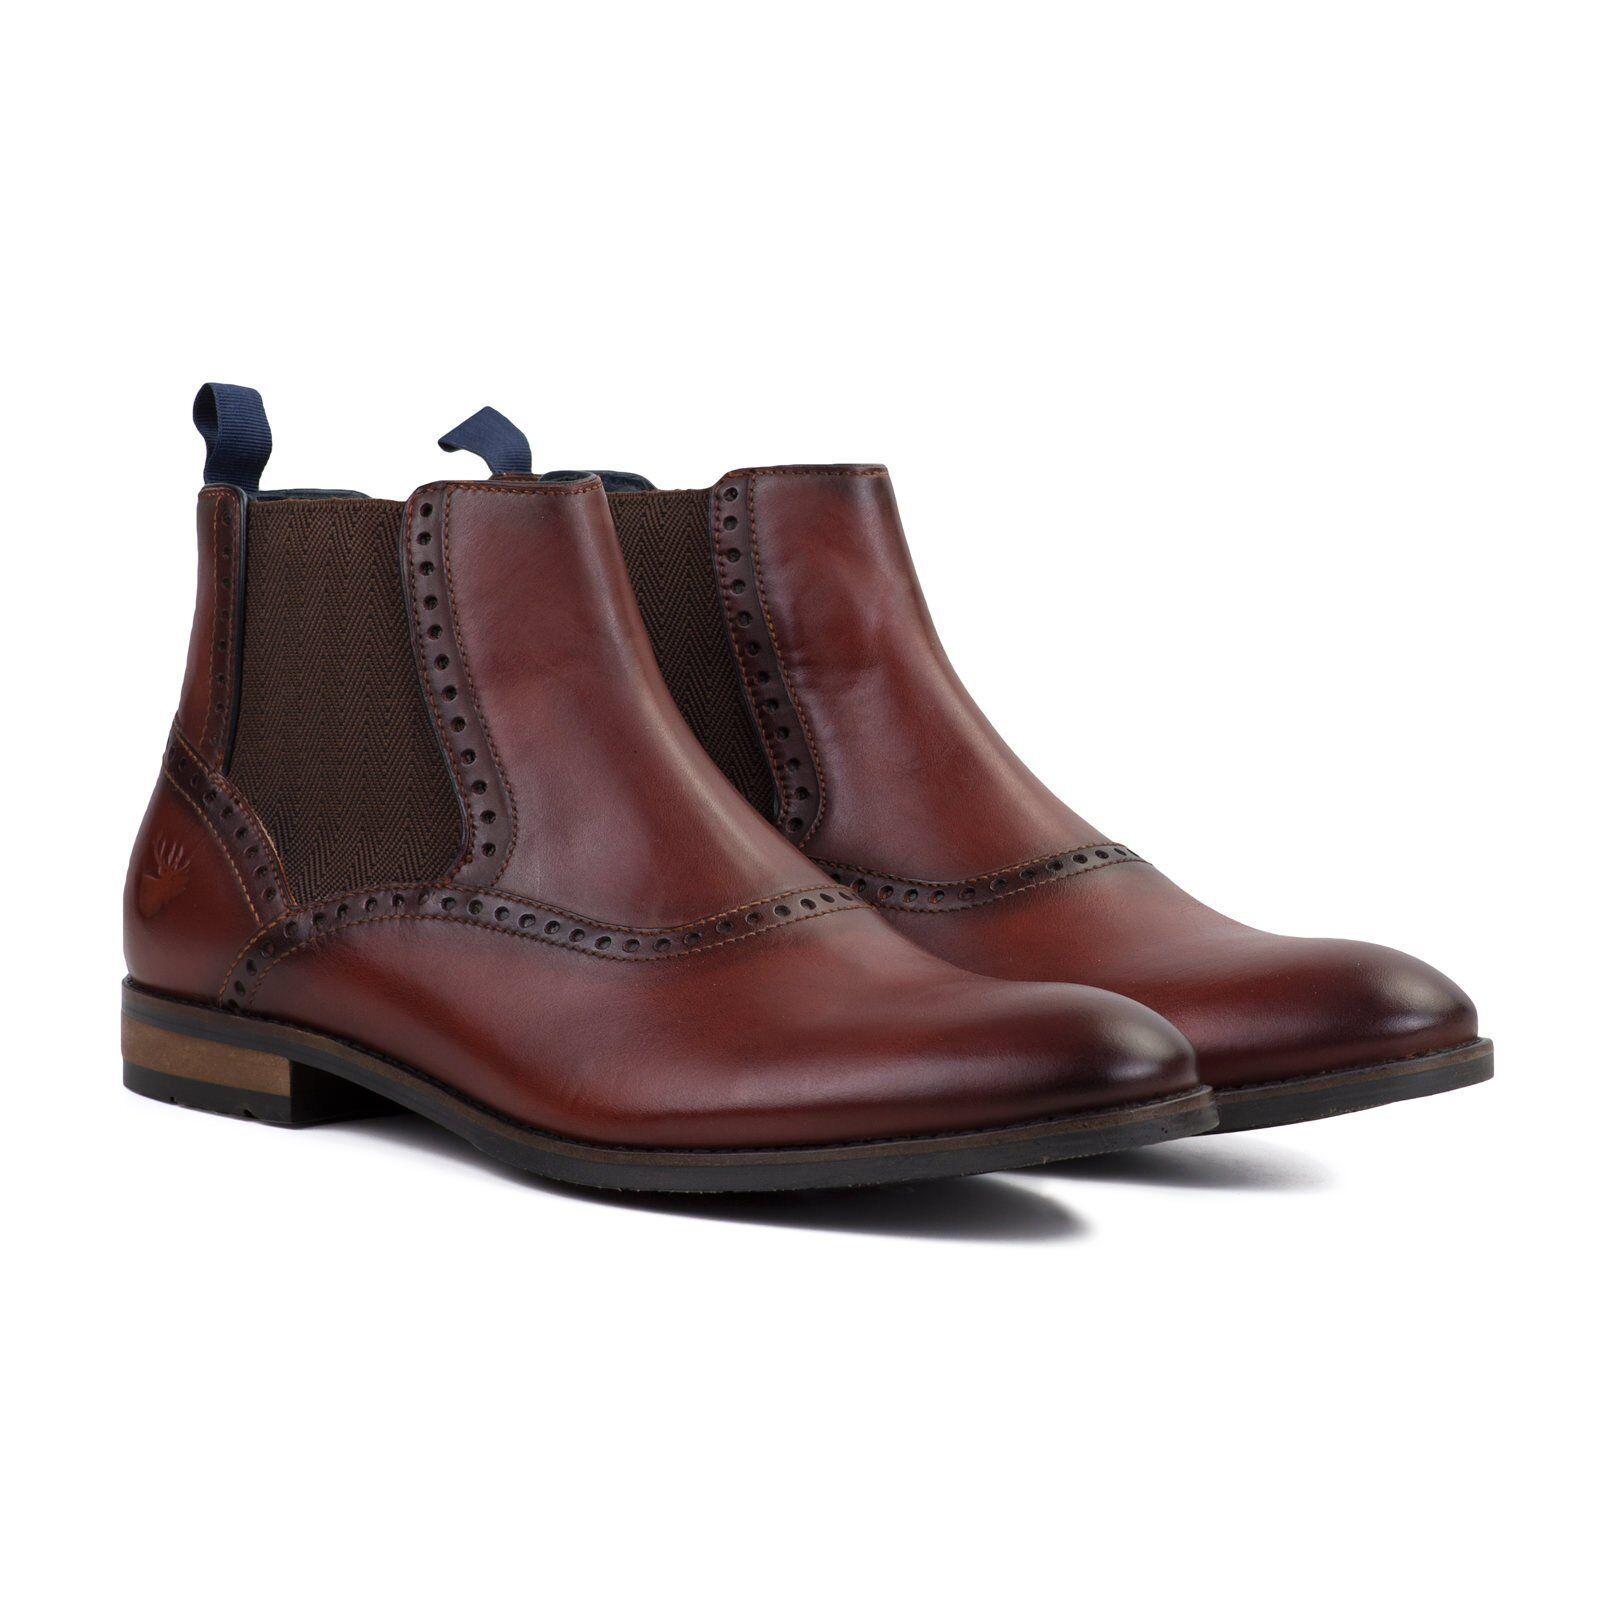 Goodwin Smith Bailey Mahogony Leather Chelsea Boots Size 8